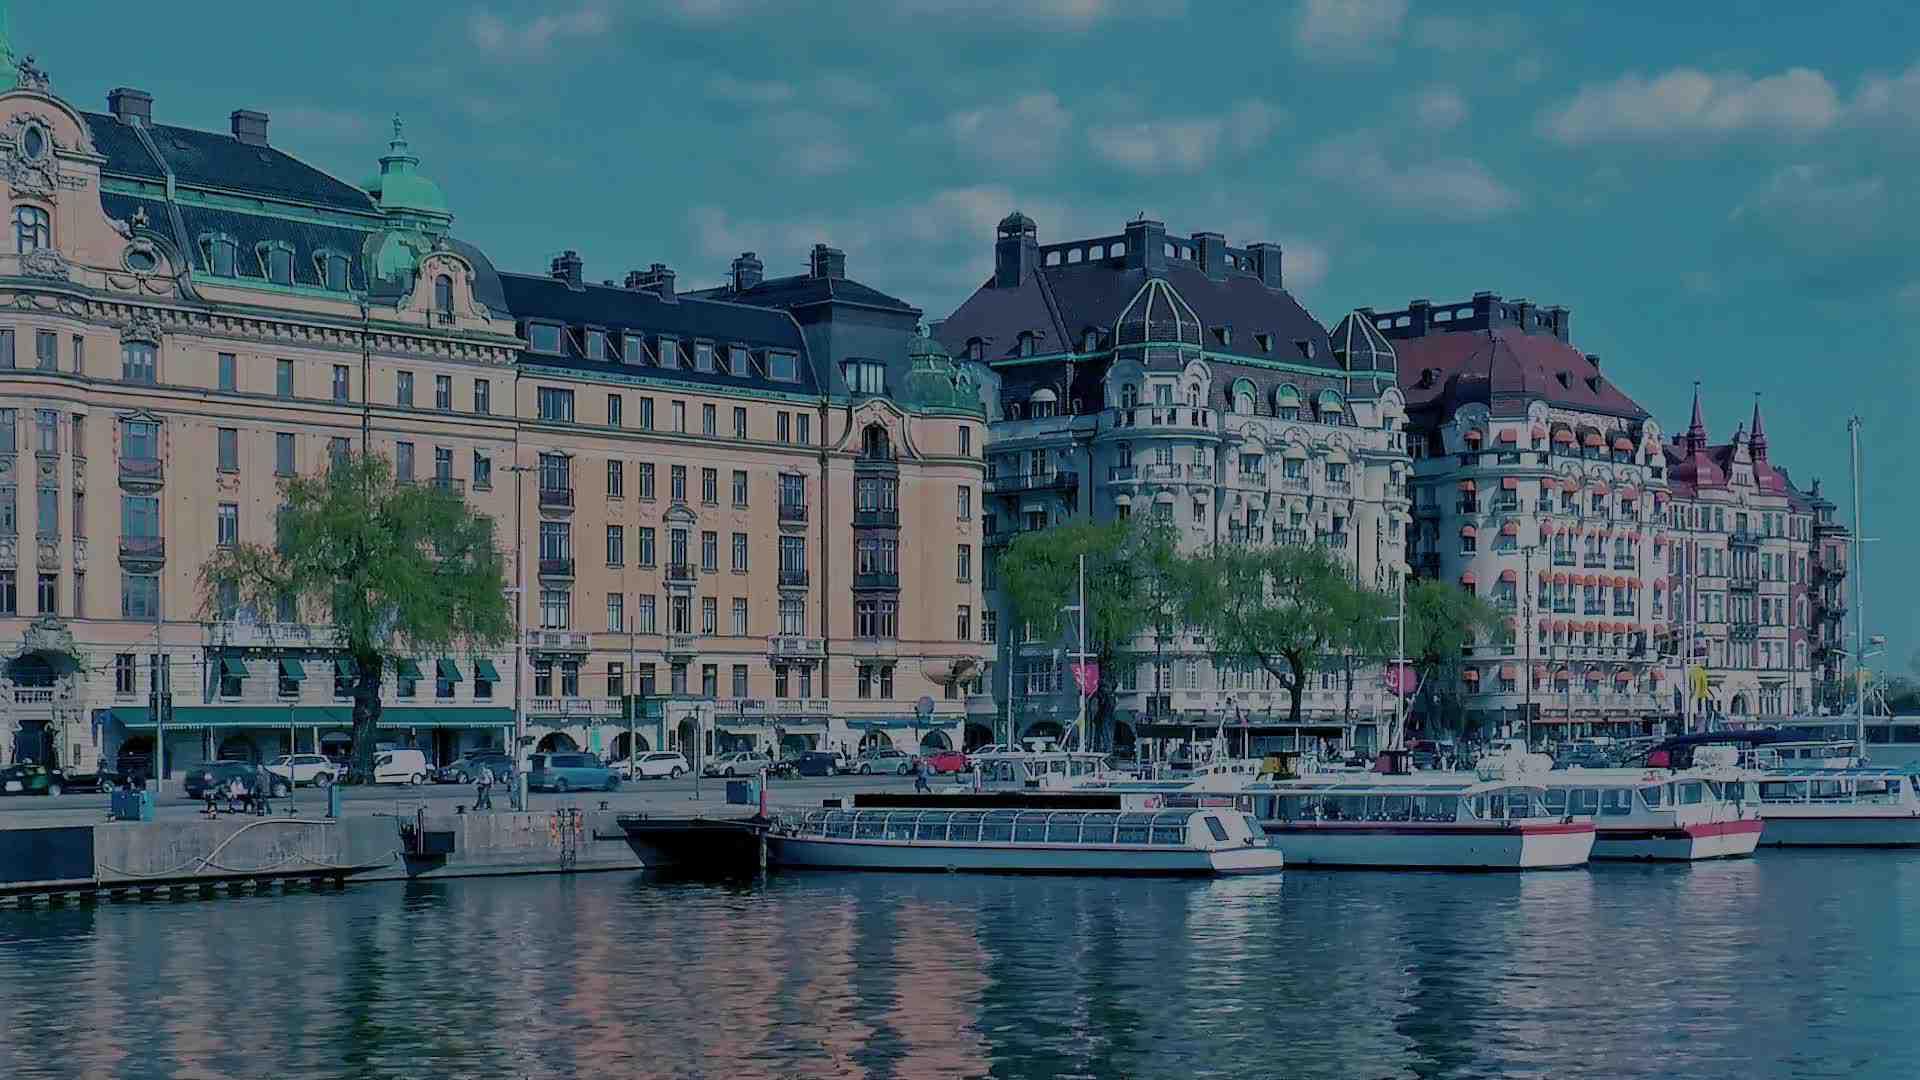 vuxenportalen sex escort stockholm